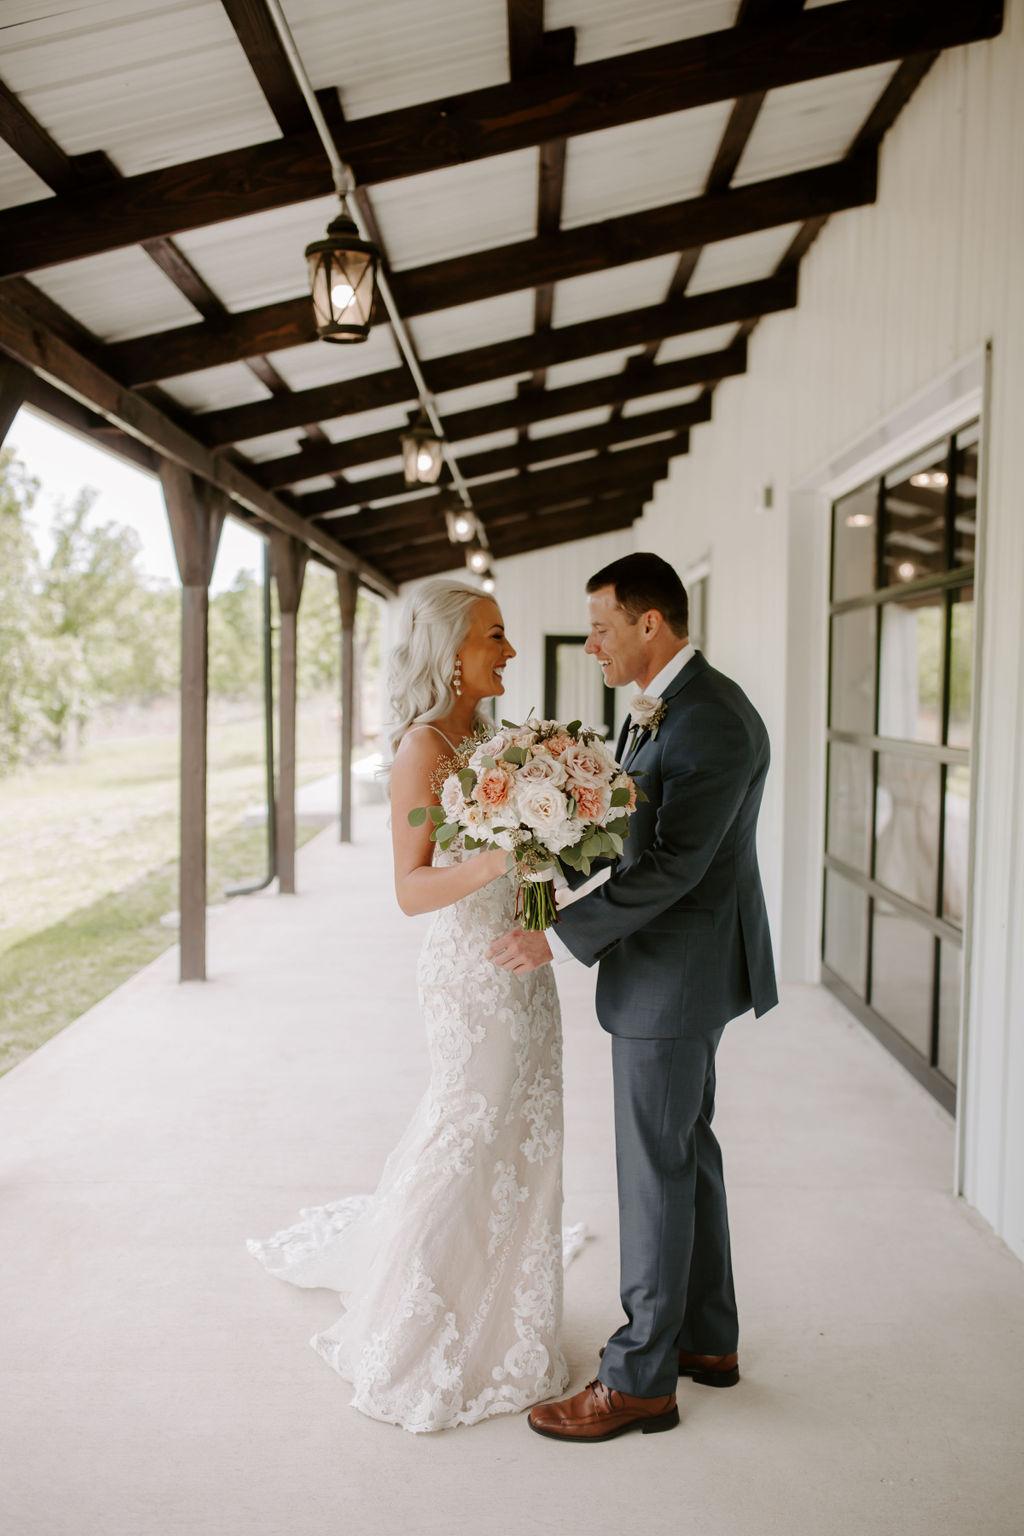 Best Oklahoma Outdoor Wedding Venue Tulsa Bixby White Barn 10.jpg